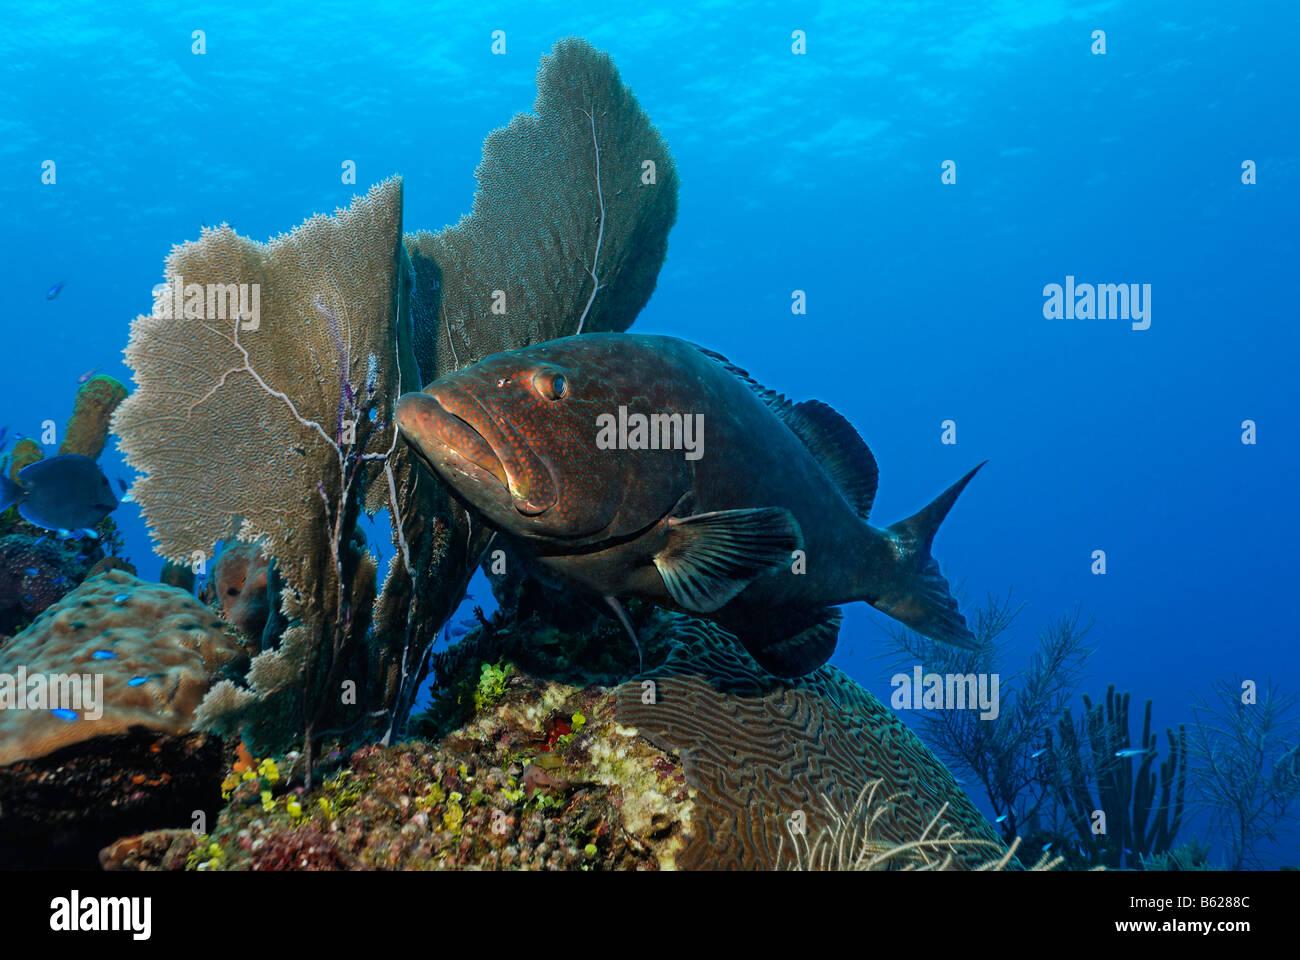 Black Grouper (Mycteroperca bonaci) lurking behind a Venus Sea Fan (Gorgonia flabellum) for prey, Hopkins, Dangria, Stock Photo